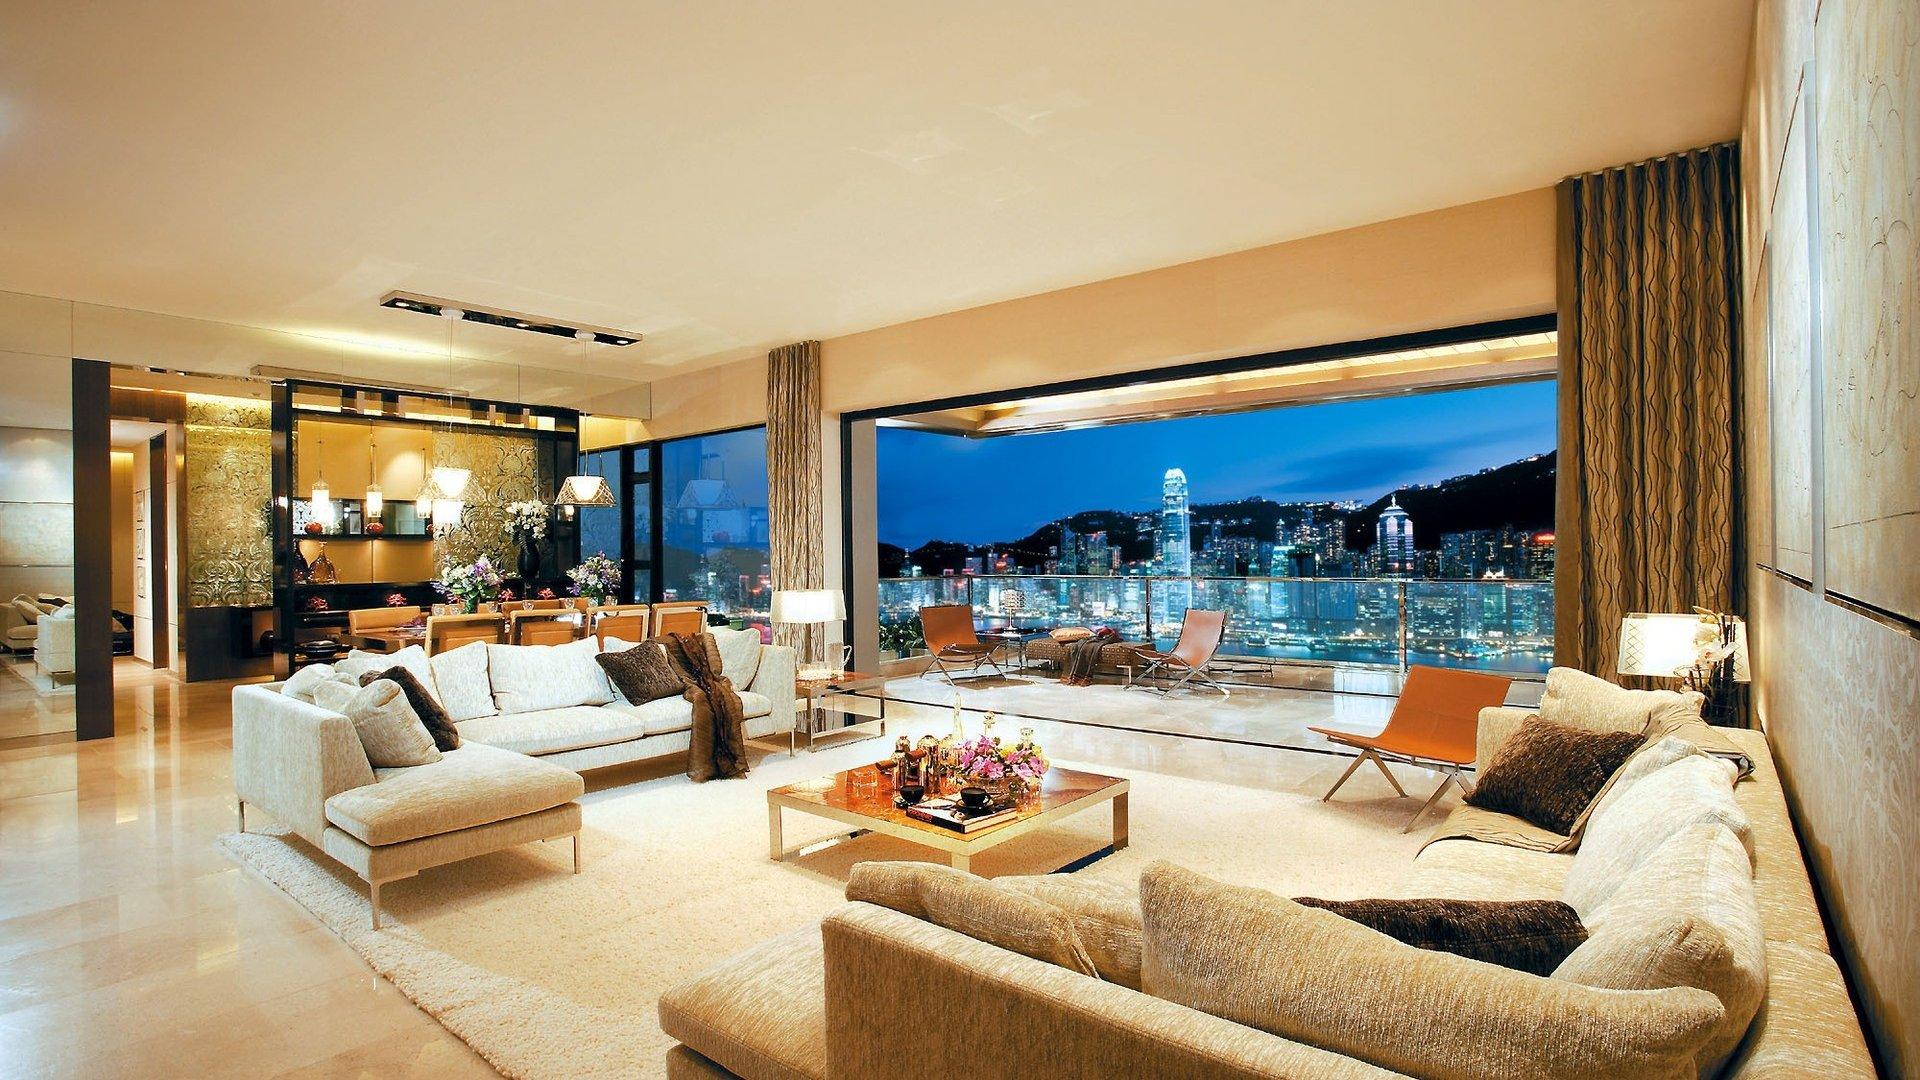 18221470215-864533-architecture-couch-interior-interior-design-living-room